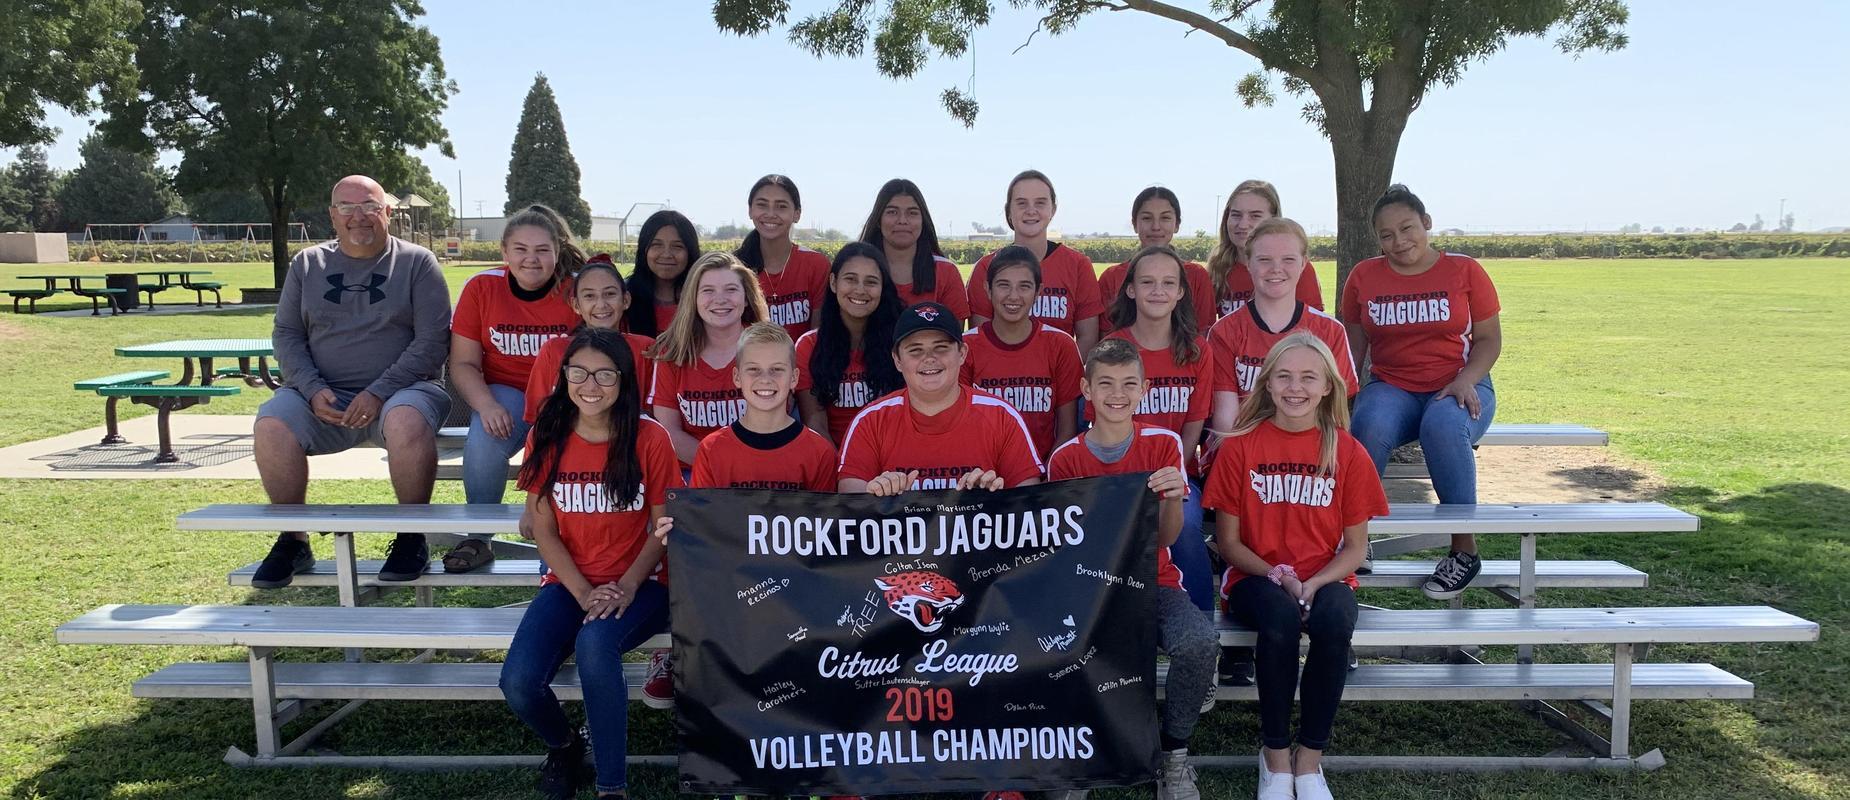 Volleyball team photo.